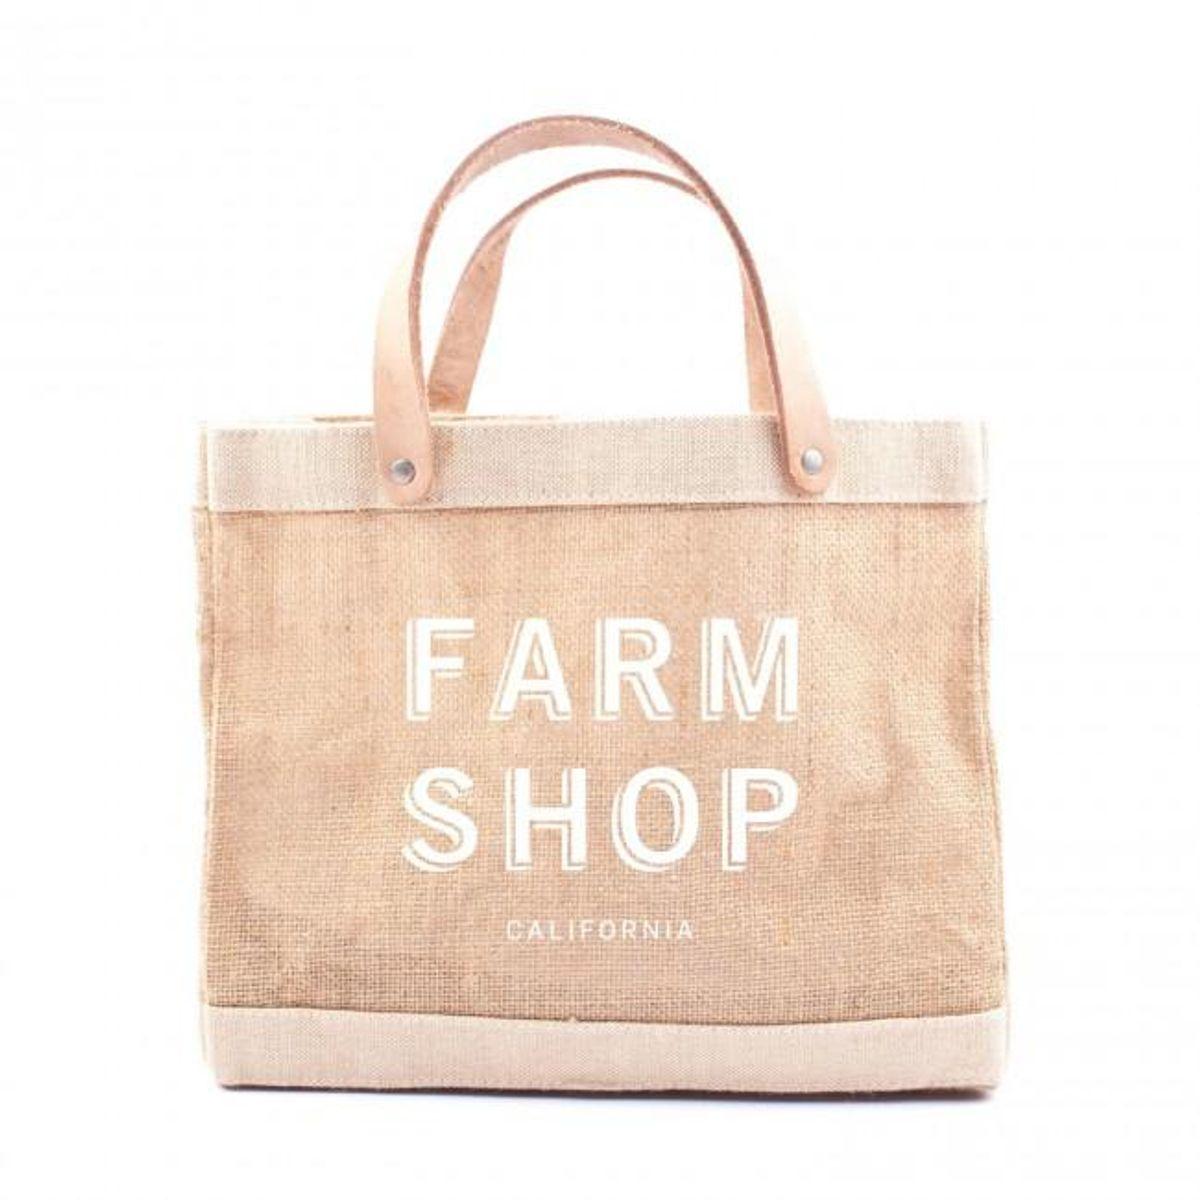 farmshop apolis small market tote